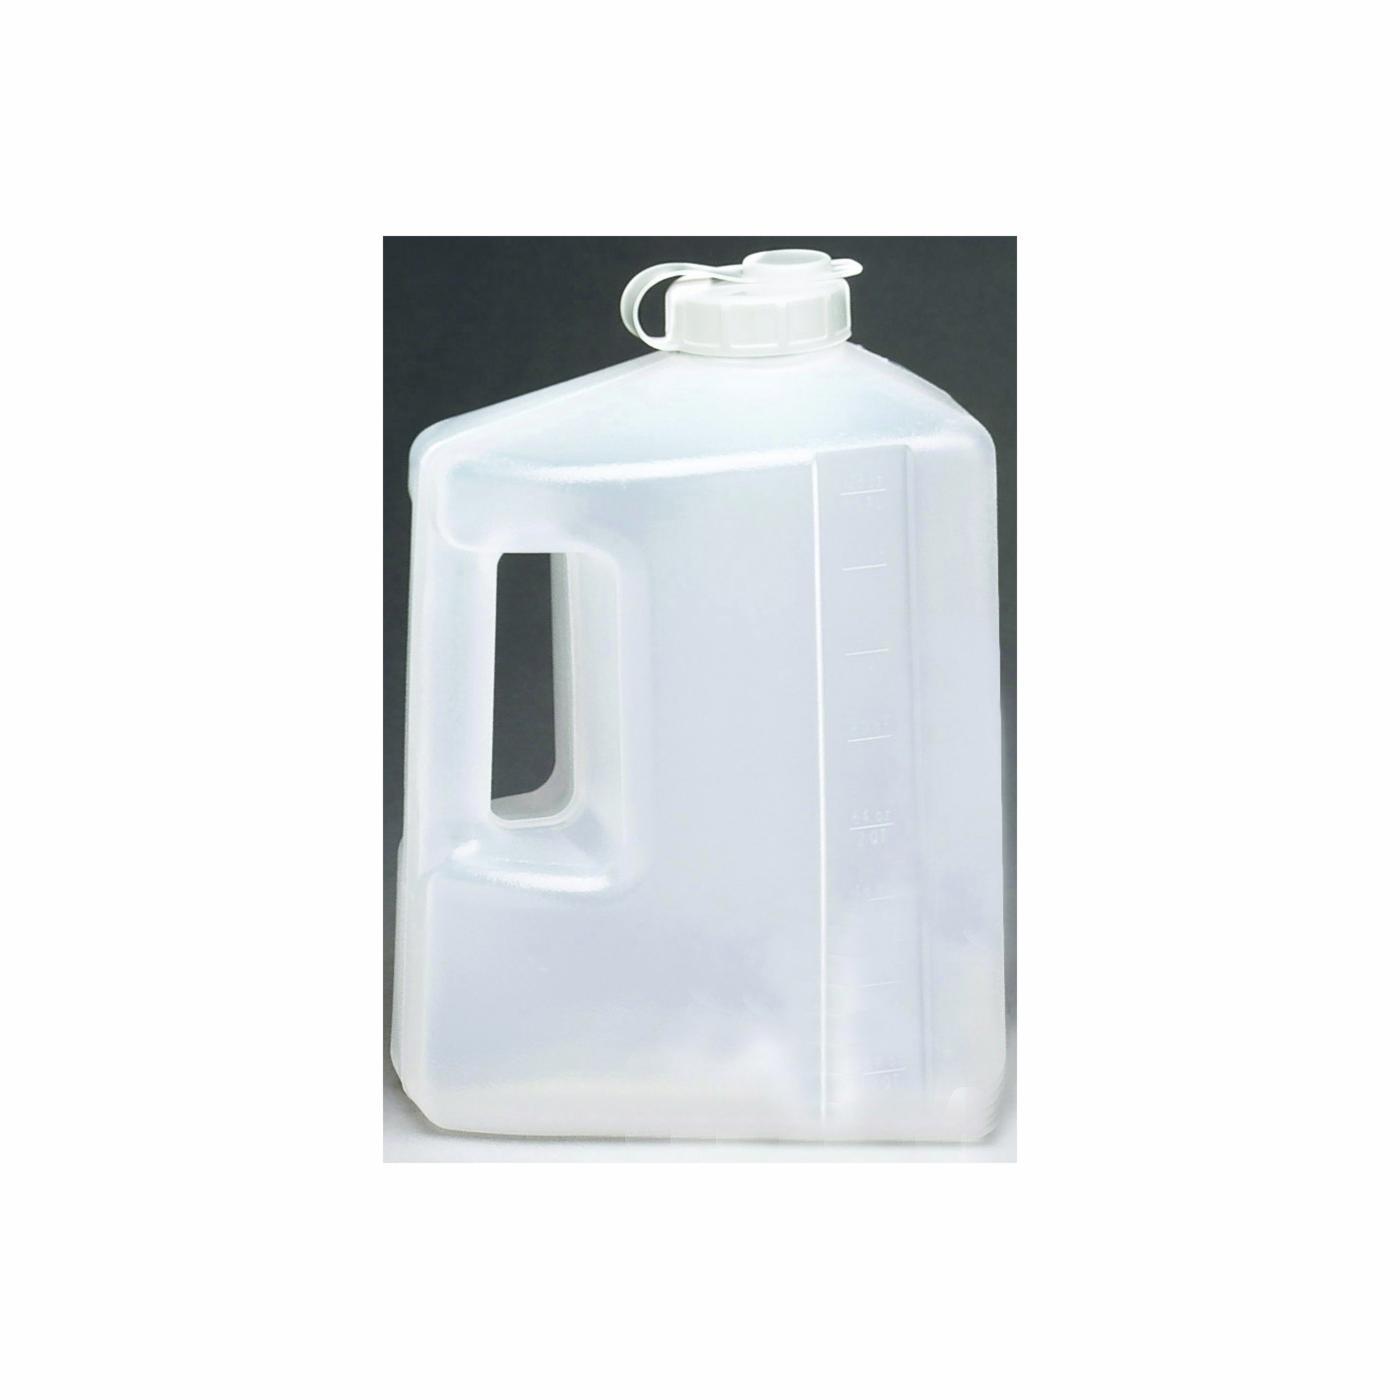 ARROW PLASTICS MFG 15405